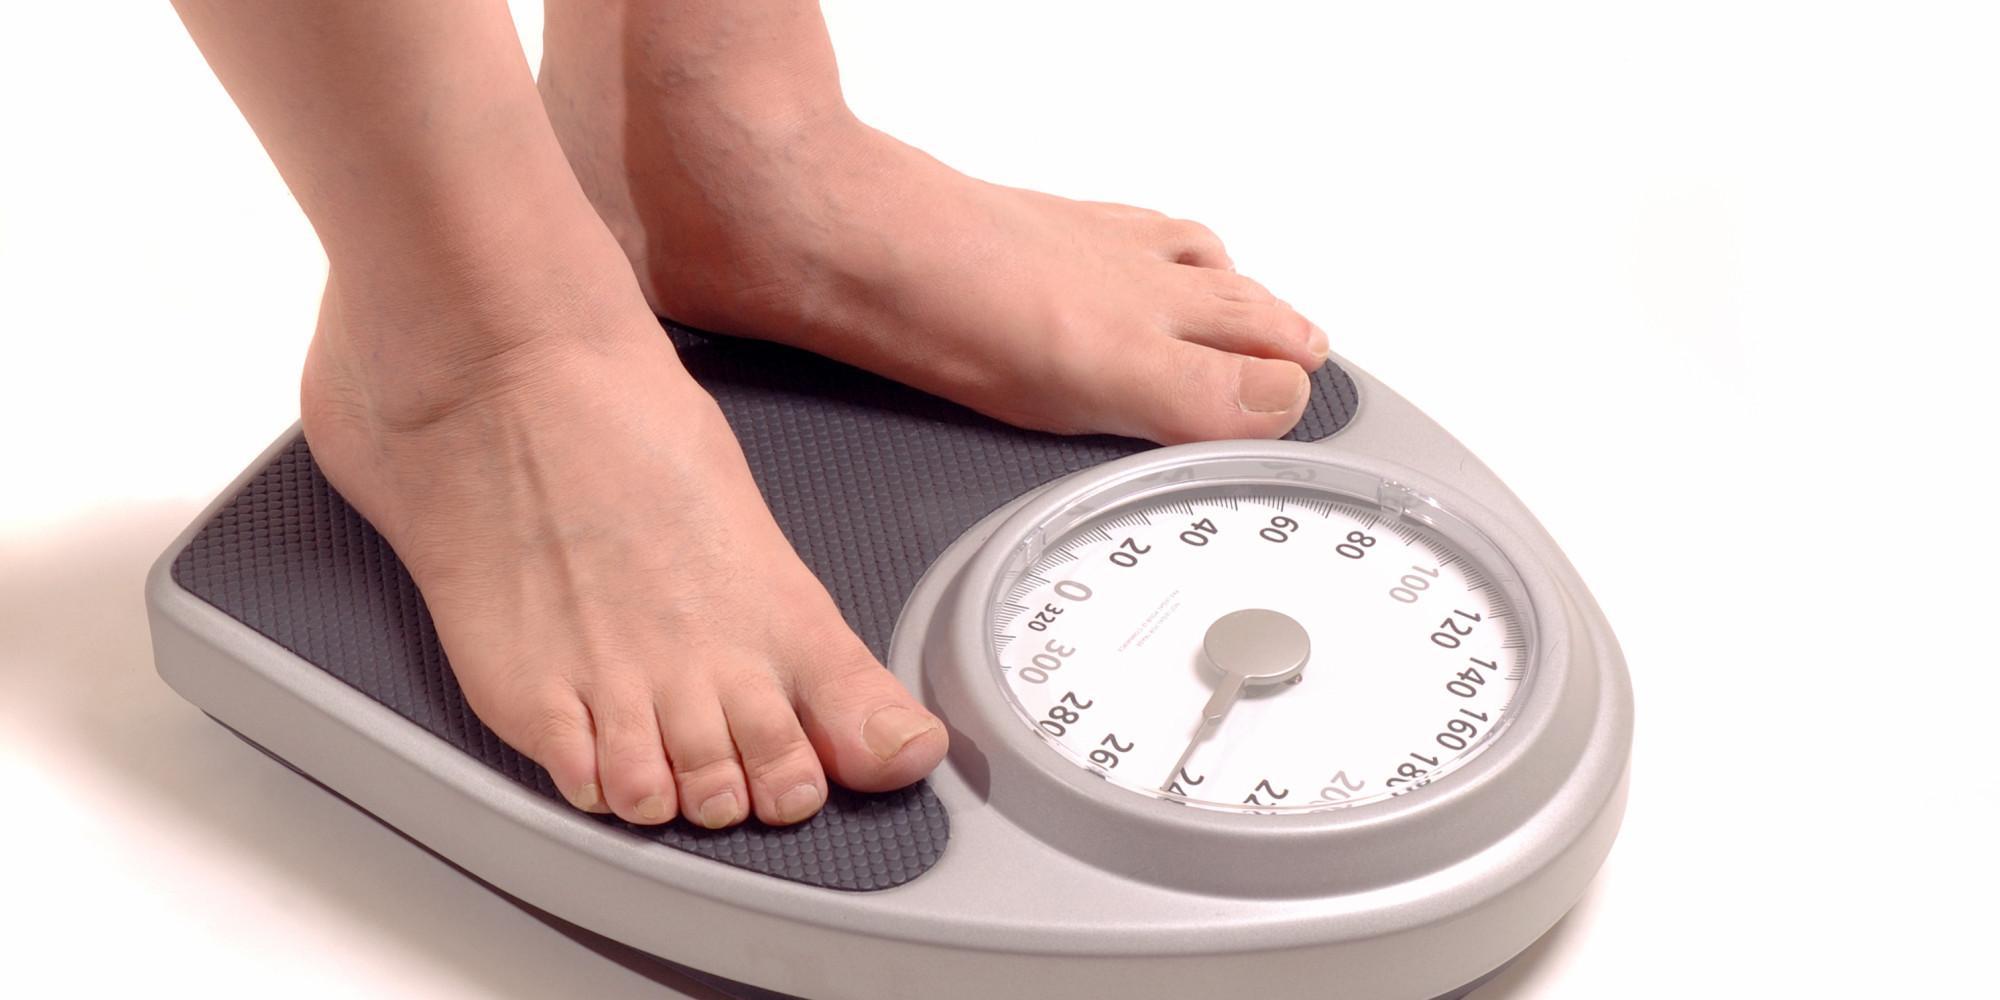 Elavil For Sleep Weight Gain